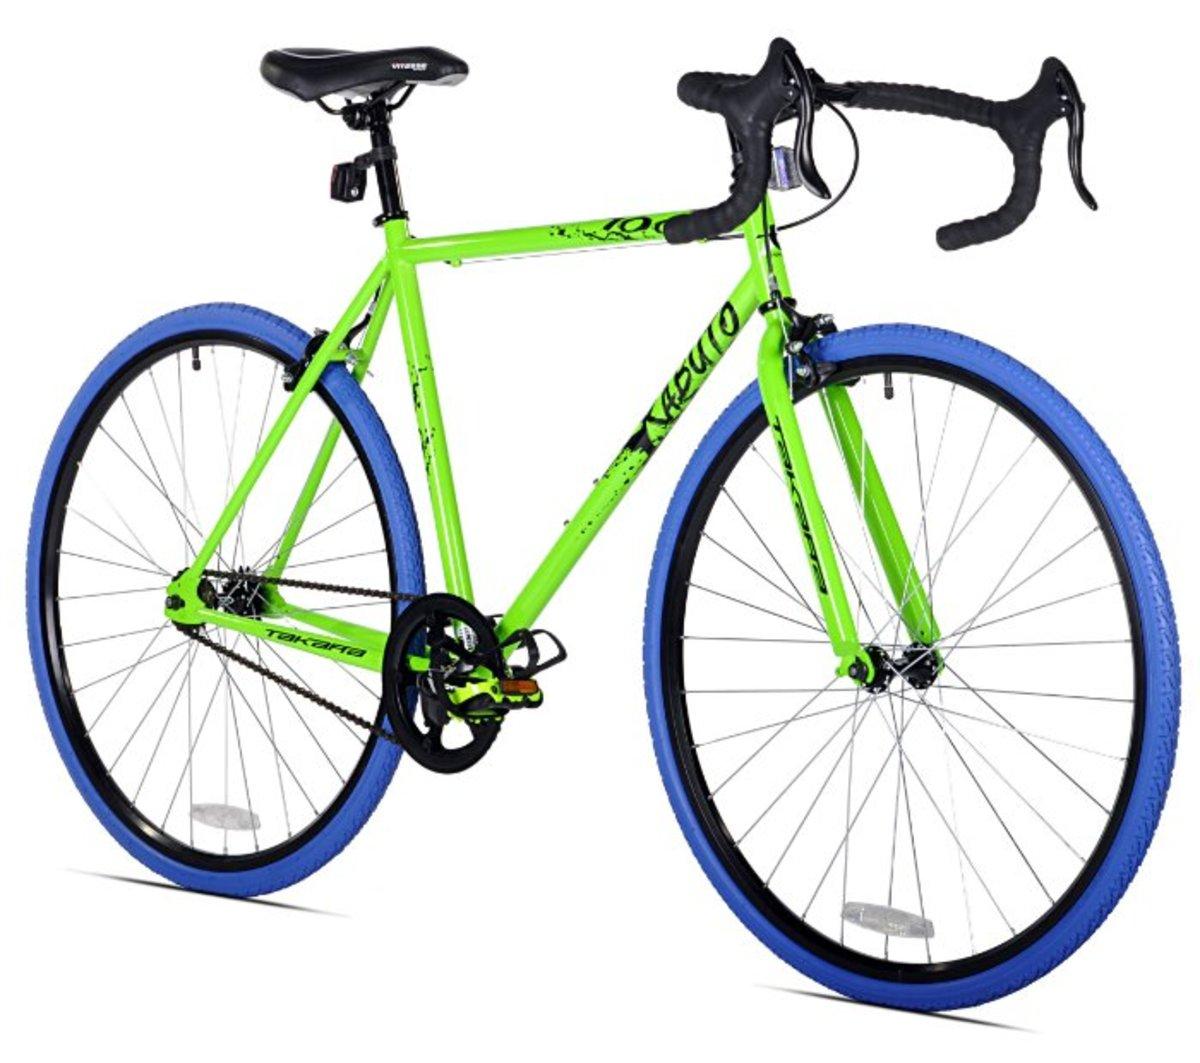 Takara Kabuto Single Speed Road Bike (Green/Blue)